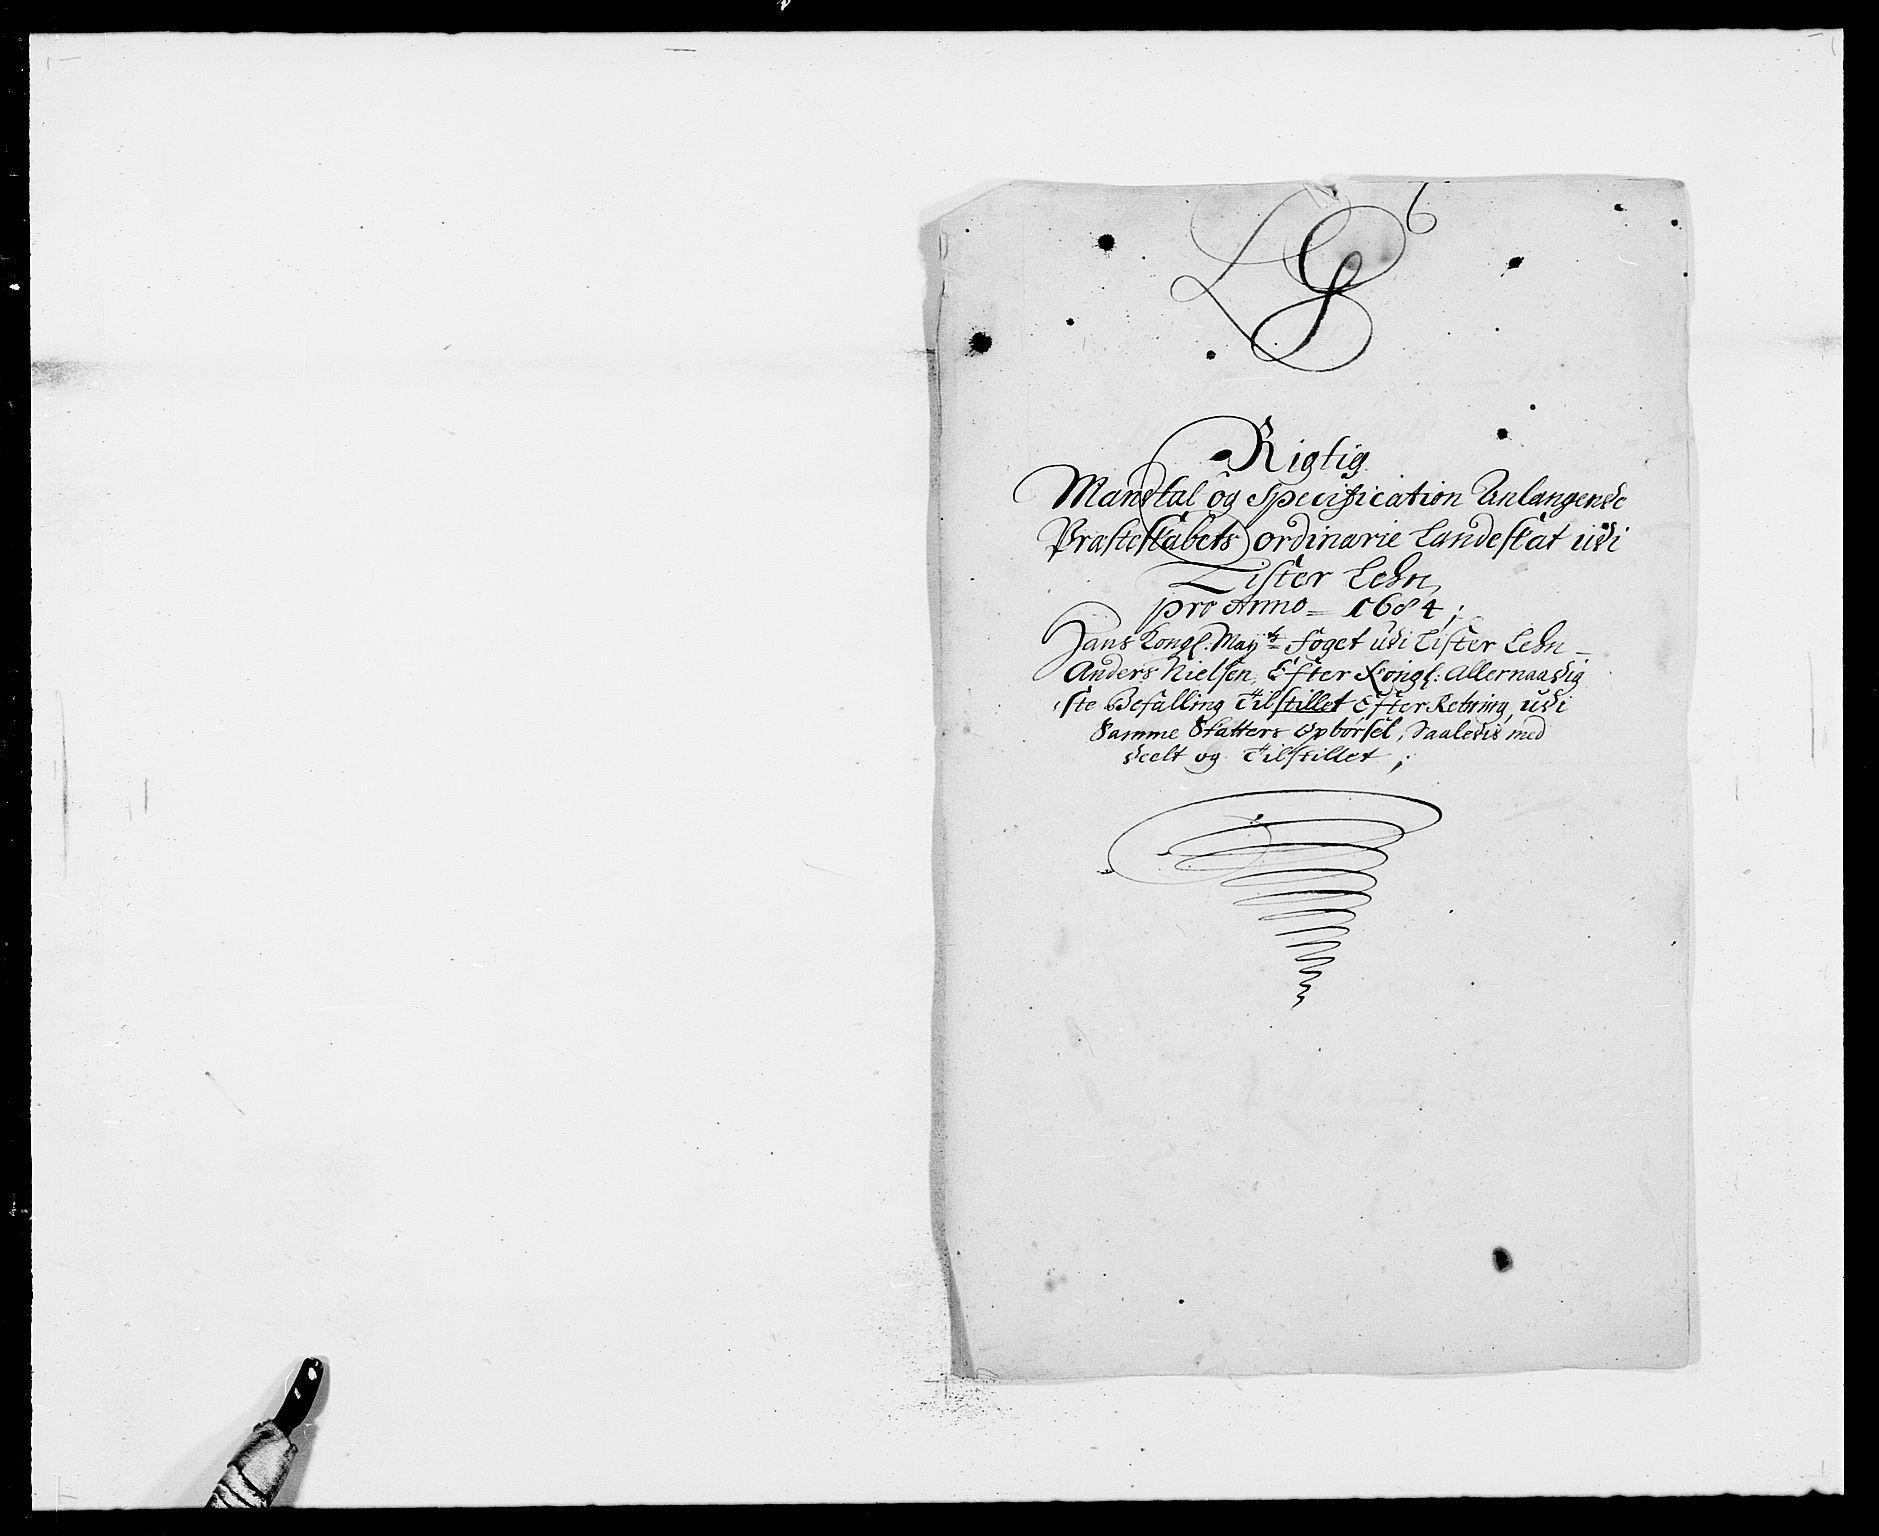 RA, Rentekammeret inntil 1814, Reviderte regnskaper, Fogderegnskap, R41/L2533: Fogderegnskap Lista, 1684-1685, s. 142